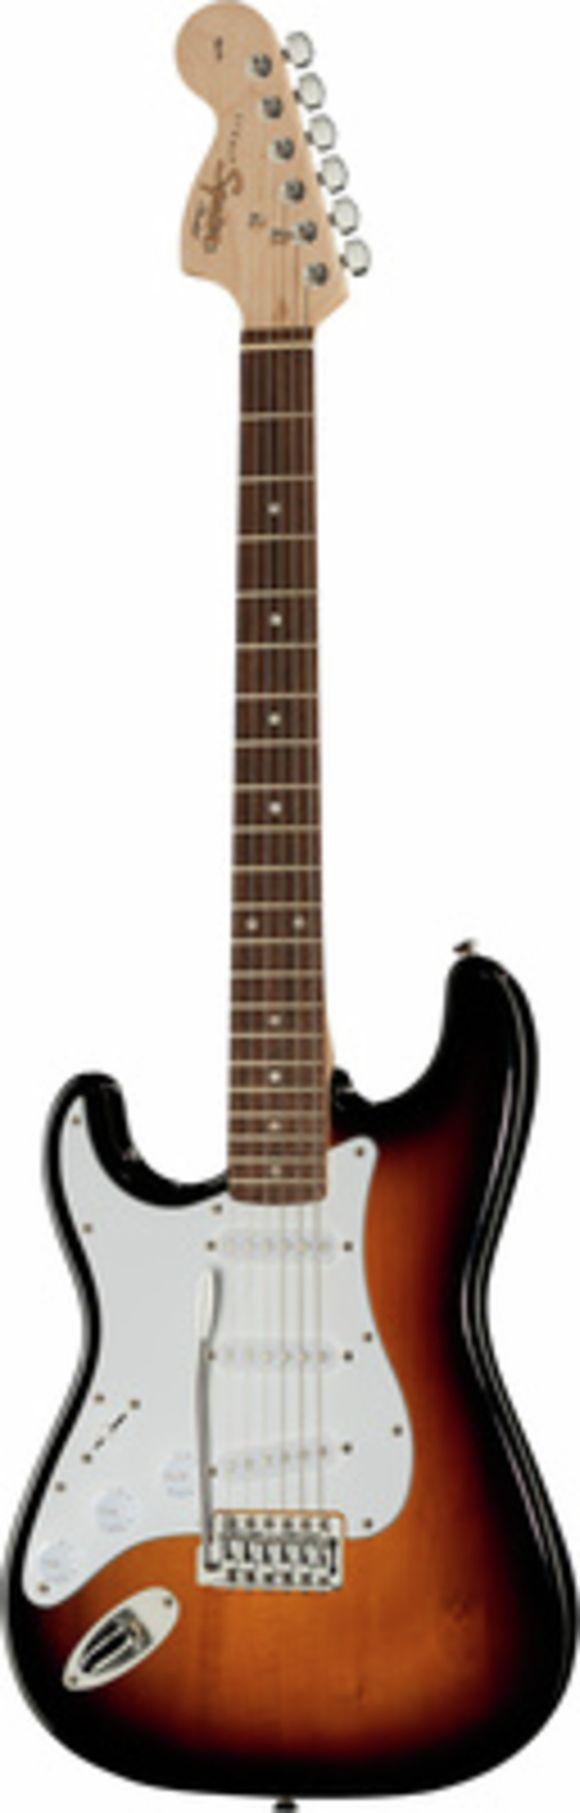 Squier Affinity LH BSB IL Fender